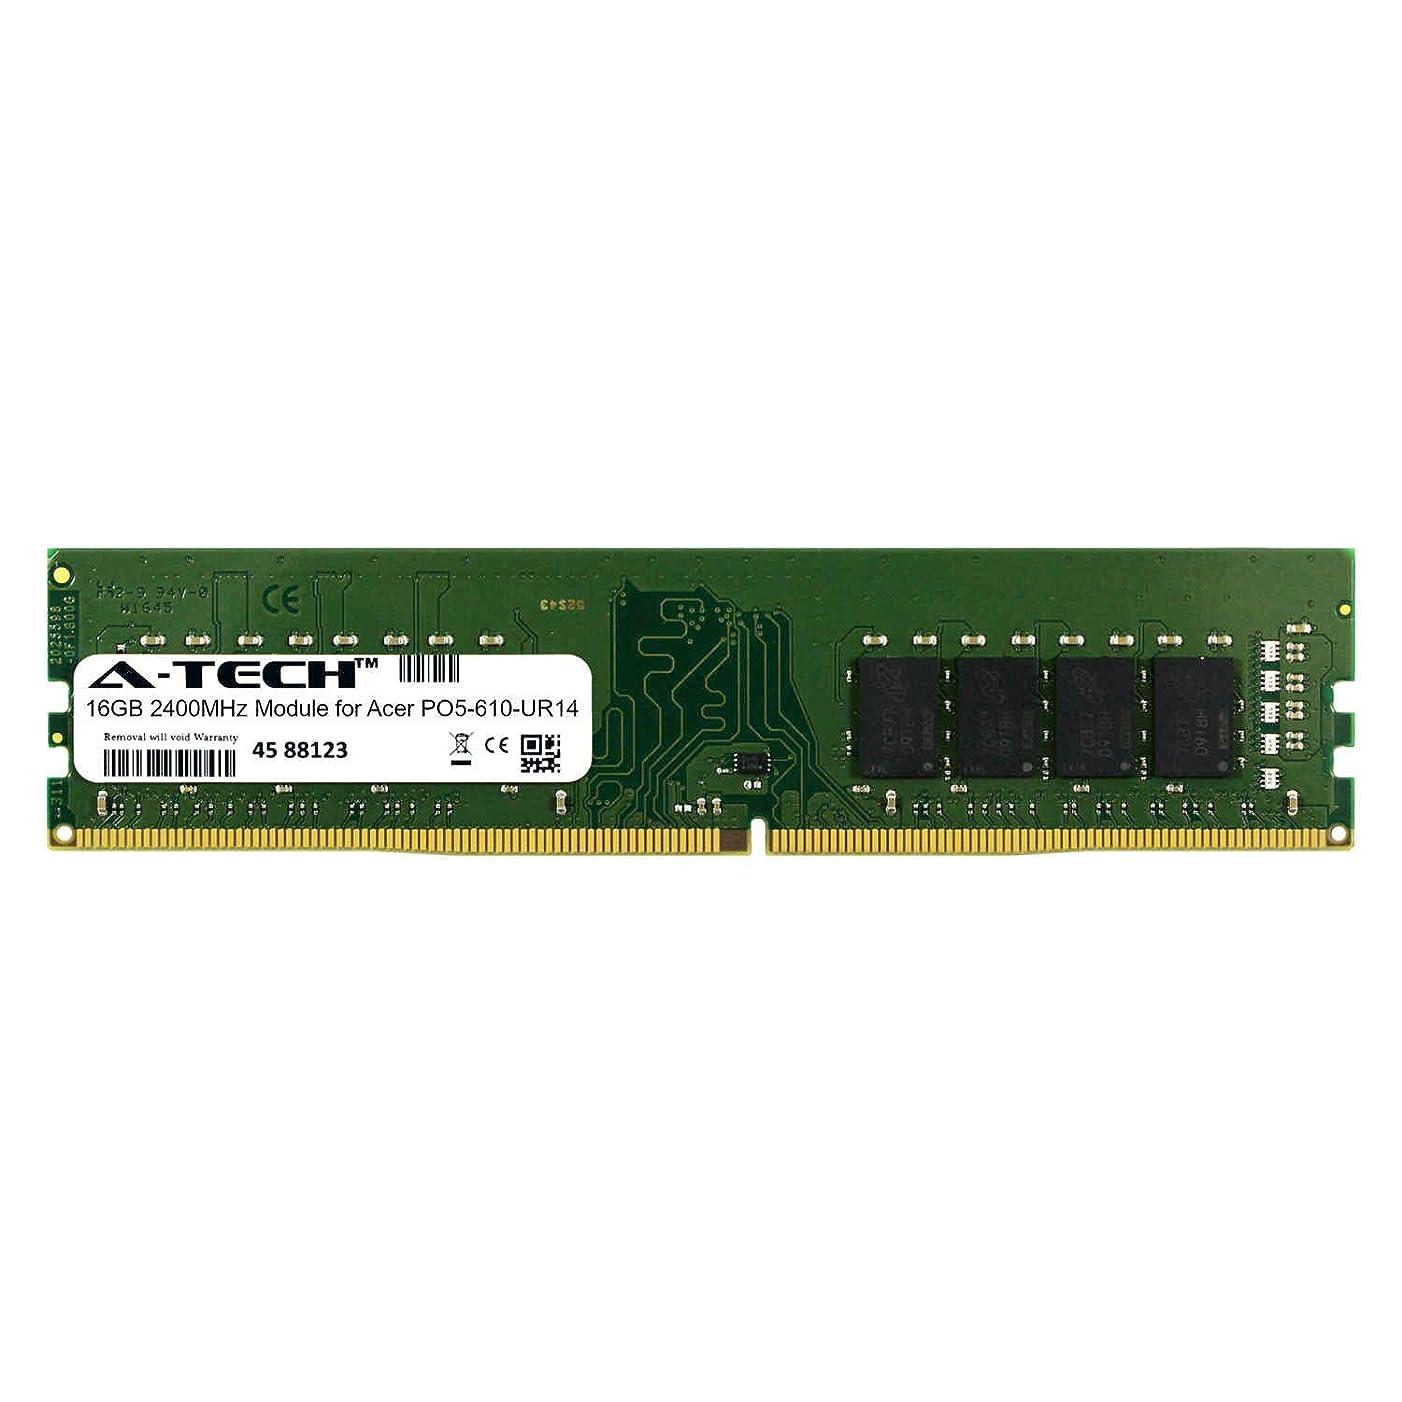 A-Tech 16GB Module for Acer PO5-610-UR14 Desktop & Workstation Motherboard Compatible DDR4 2400Mhz Memory Ram (ATMS396599A25822X1)